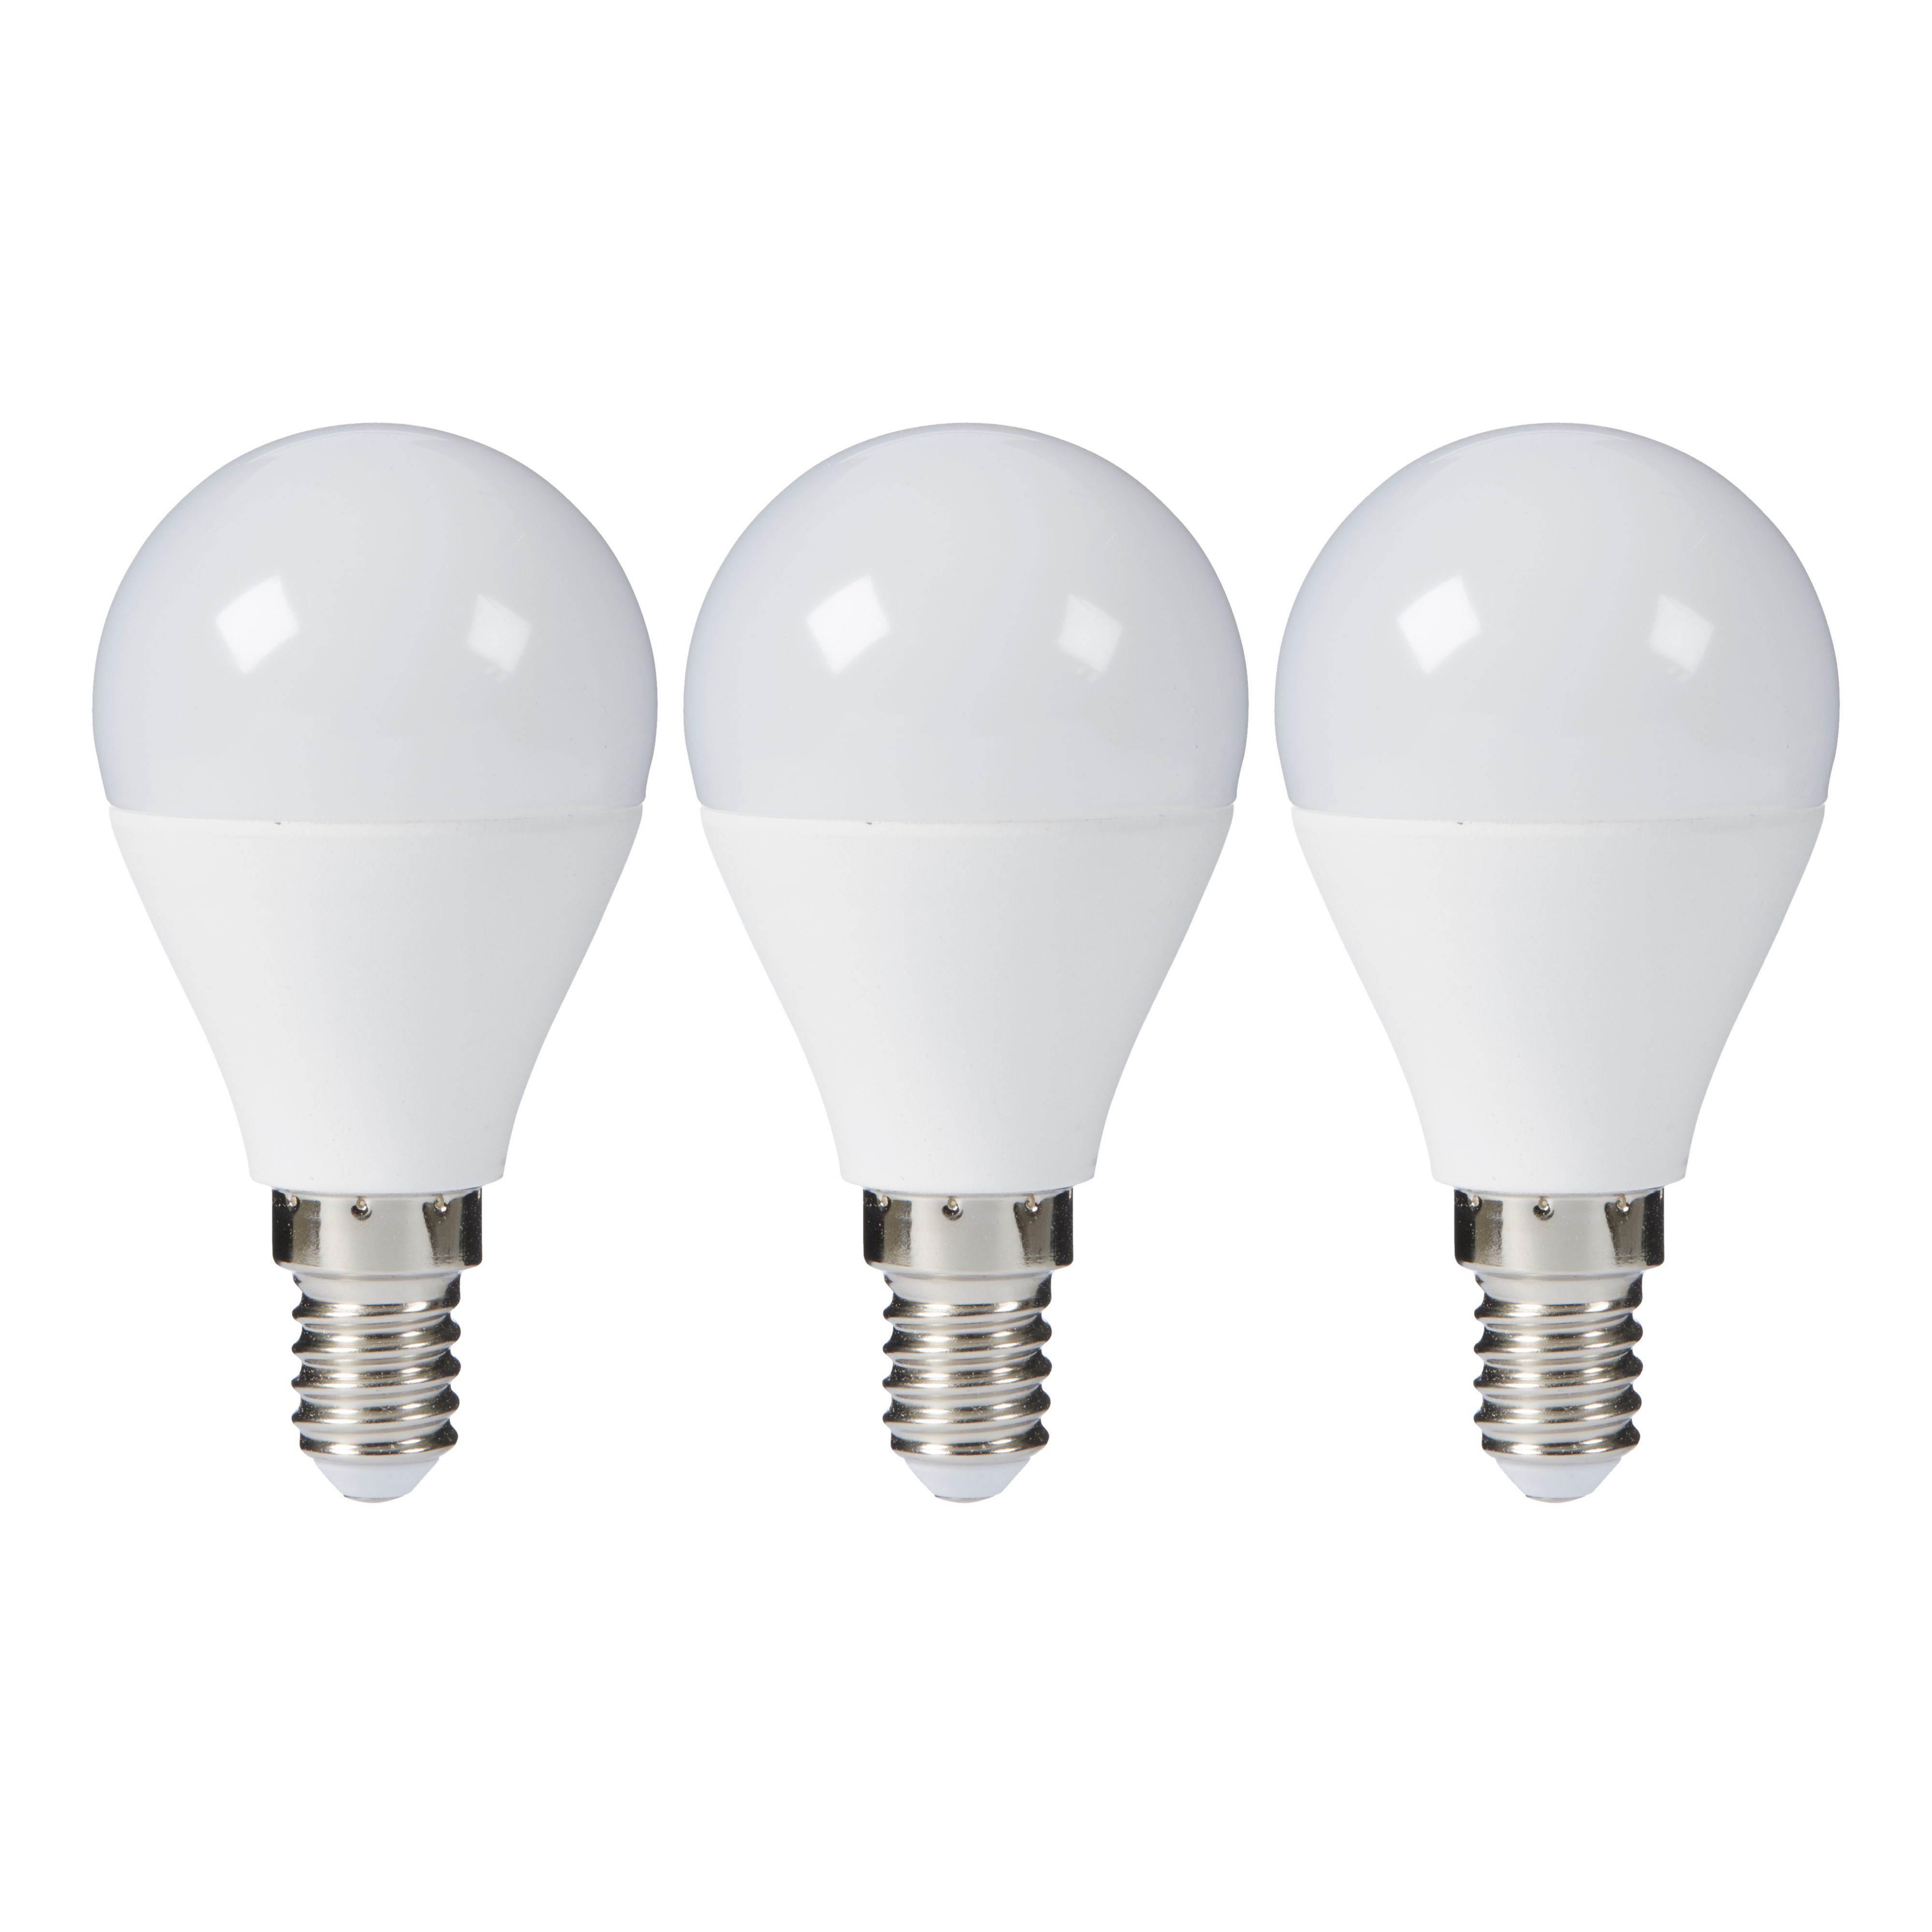 Diall E14 806lm LED Round Light Bulb, Pack Of 3